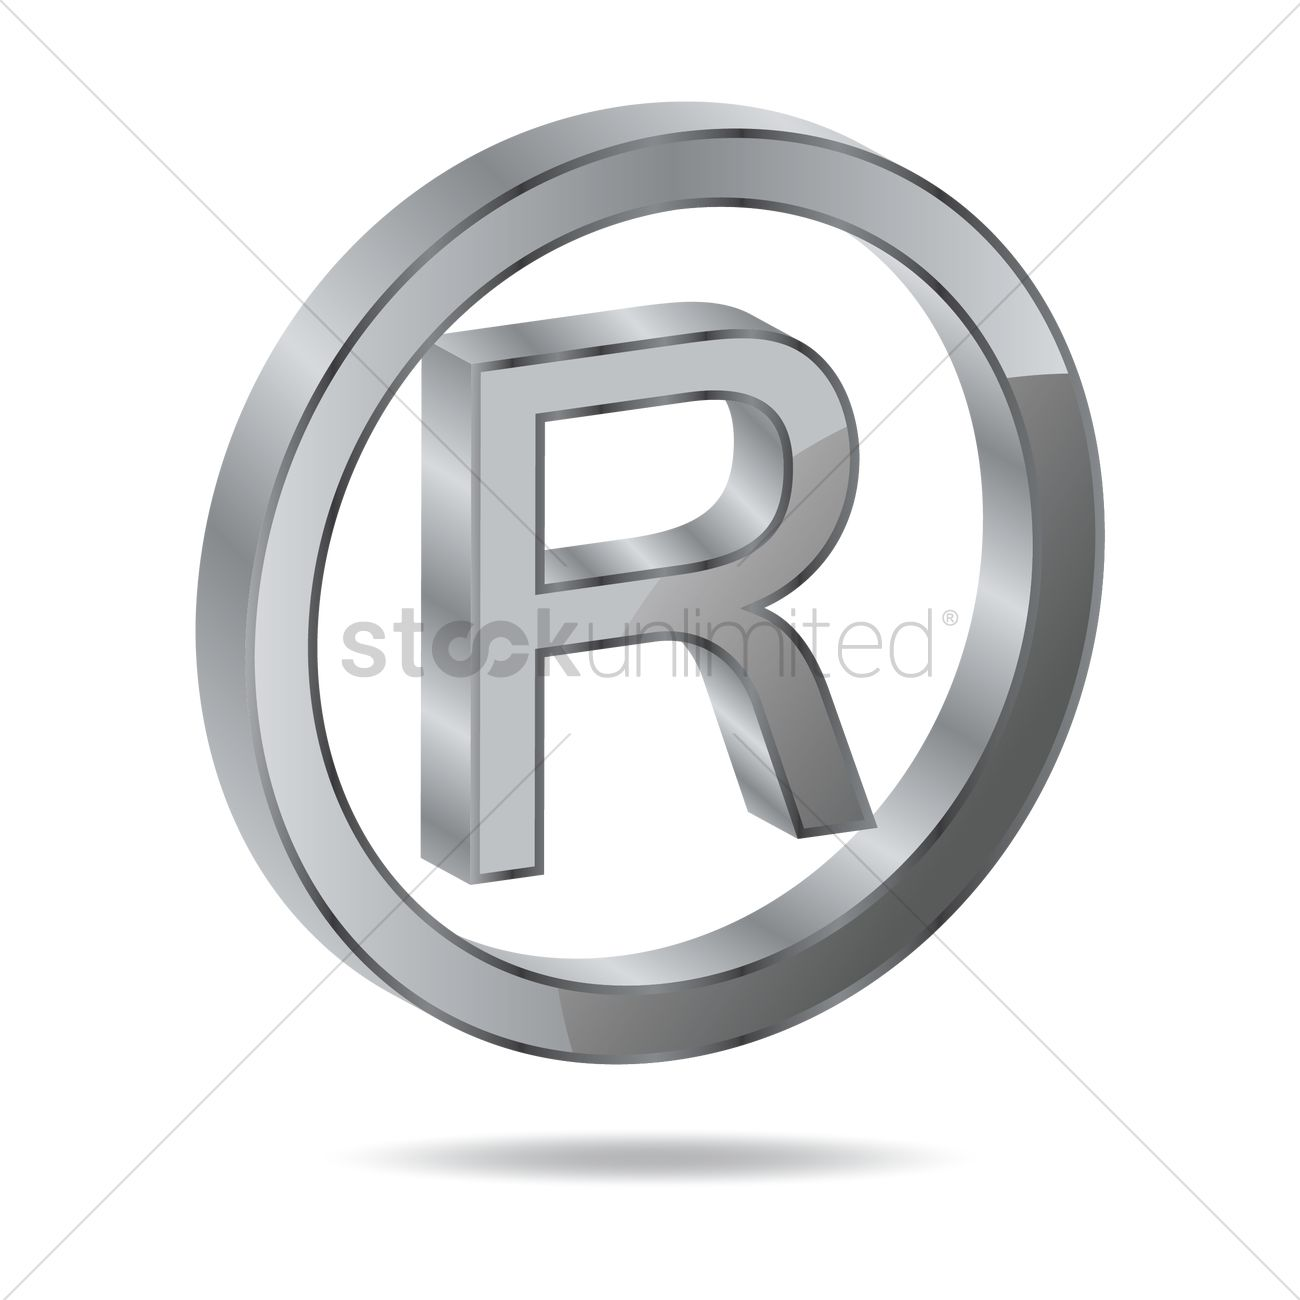 Registered trademark symbol vector image 1631446 stockunlimited registered trademark symbol vector graphic biocorpaavc Gallery